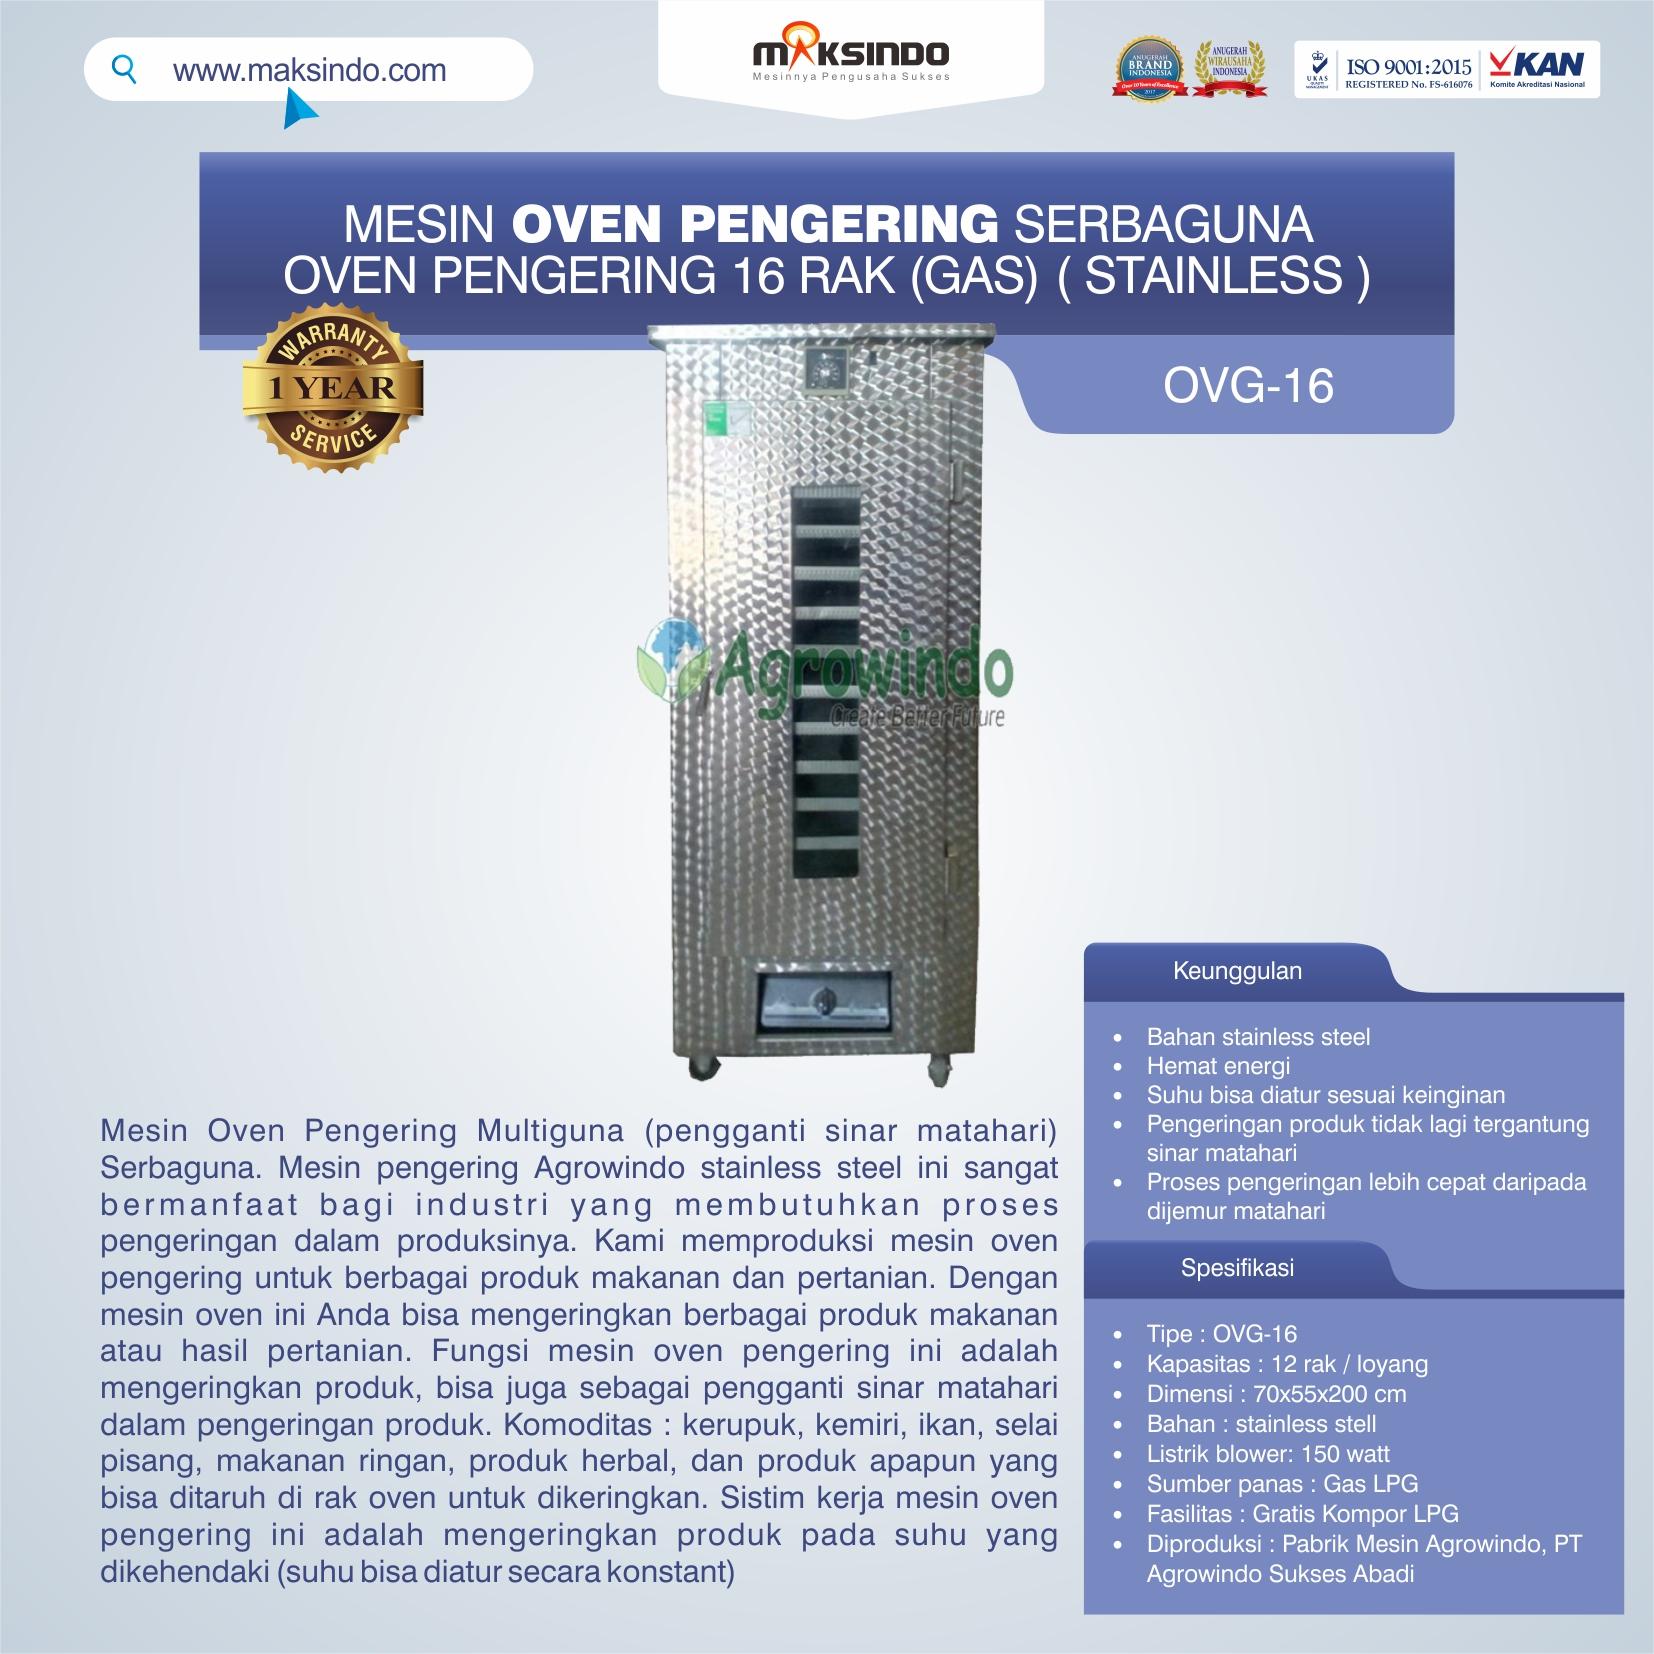 OVG-16 Mesin Oven Pengering Serbaguna 16 Rak (Gas) (Stainless )